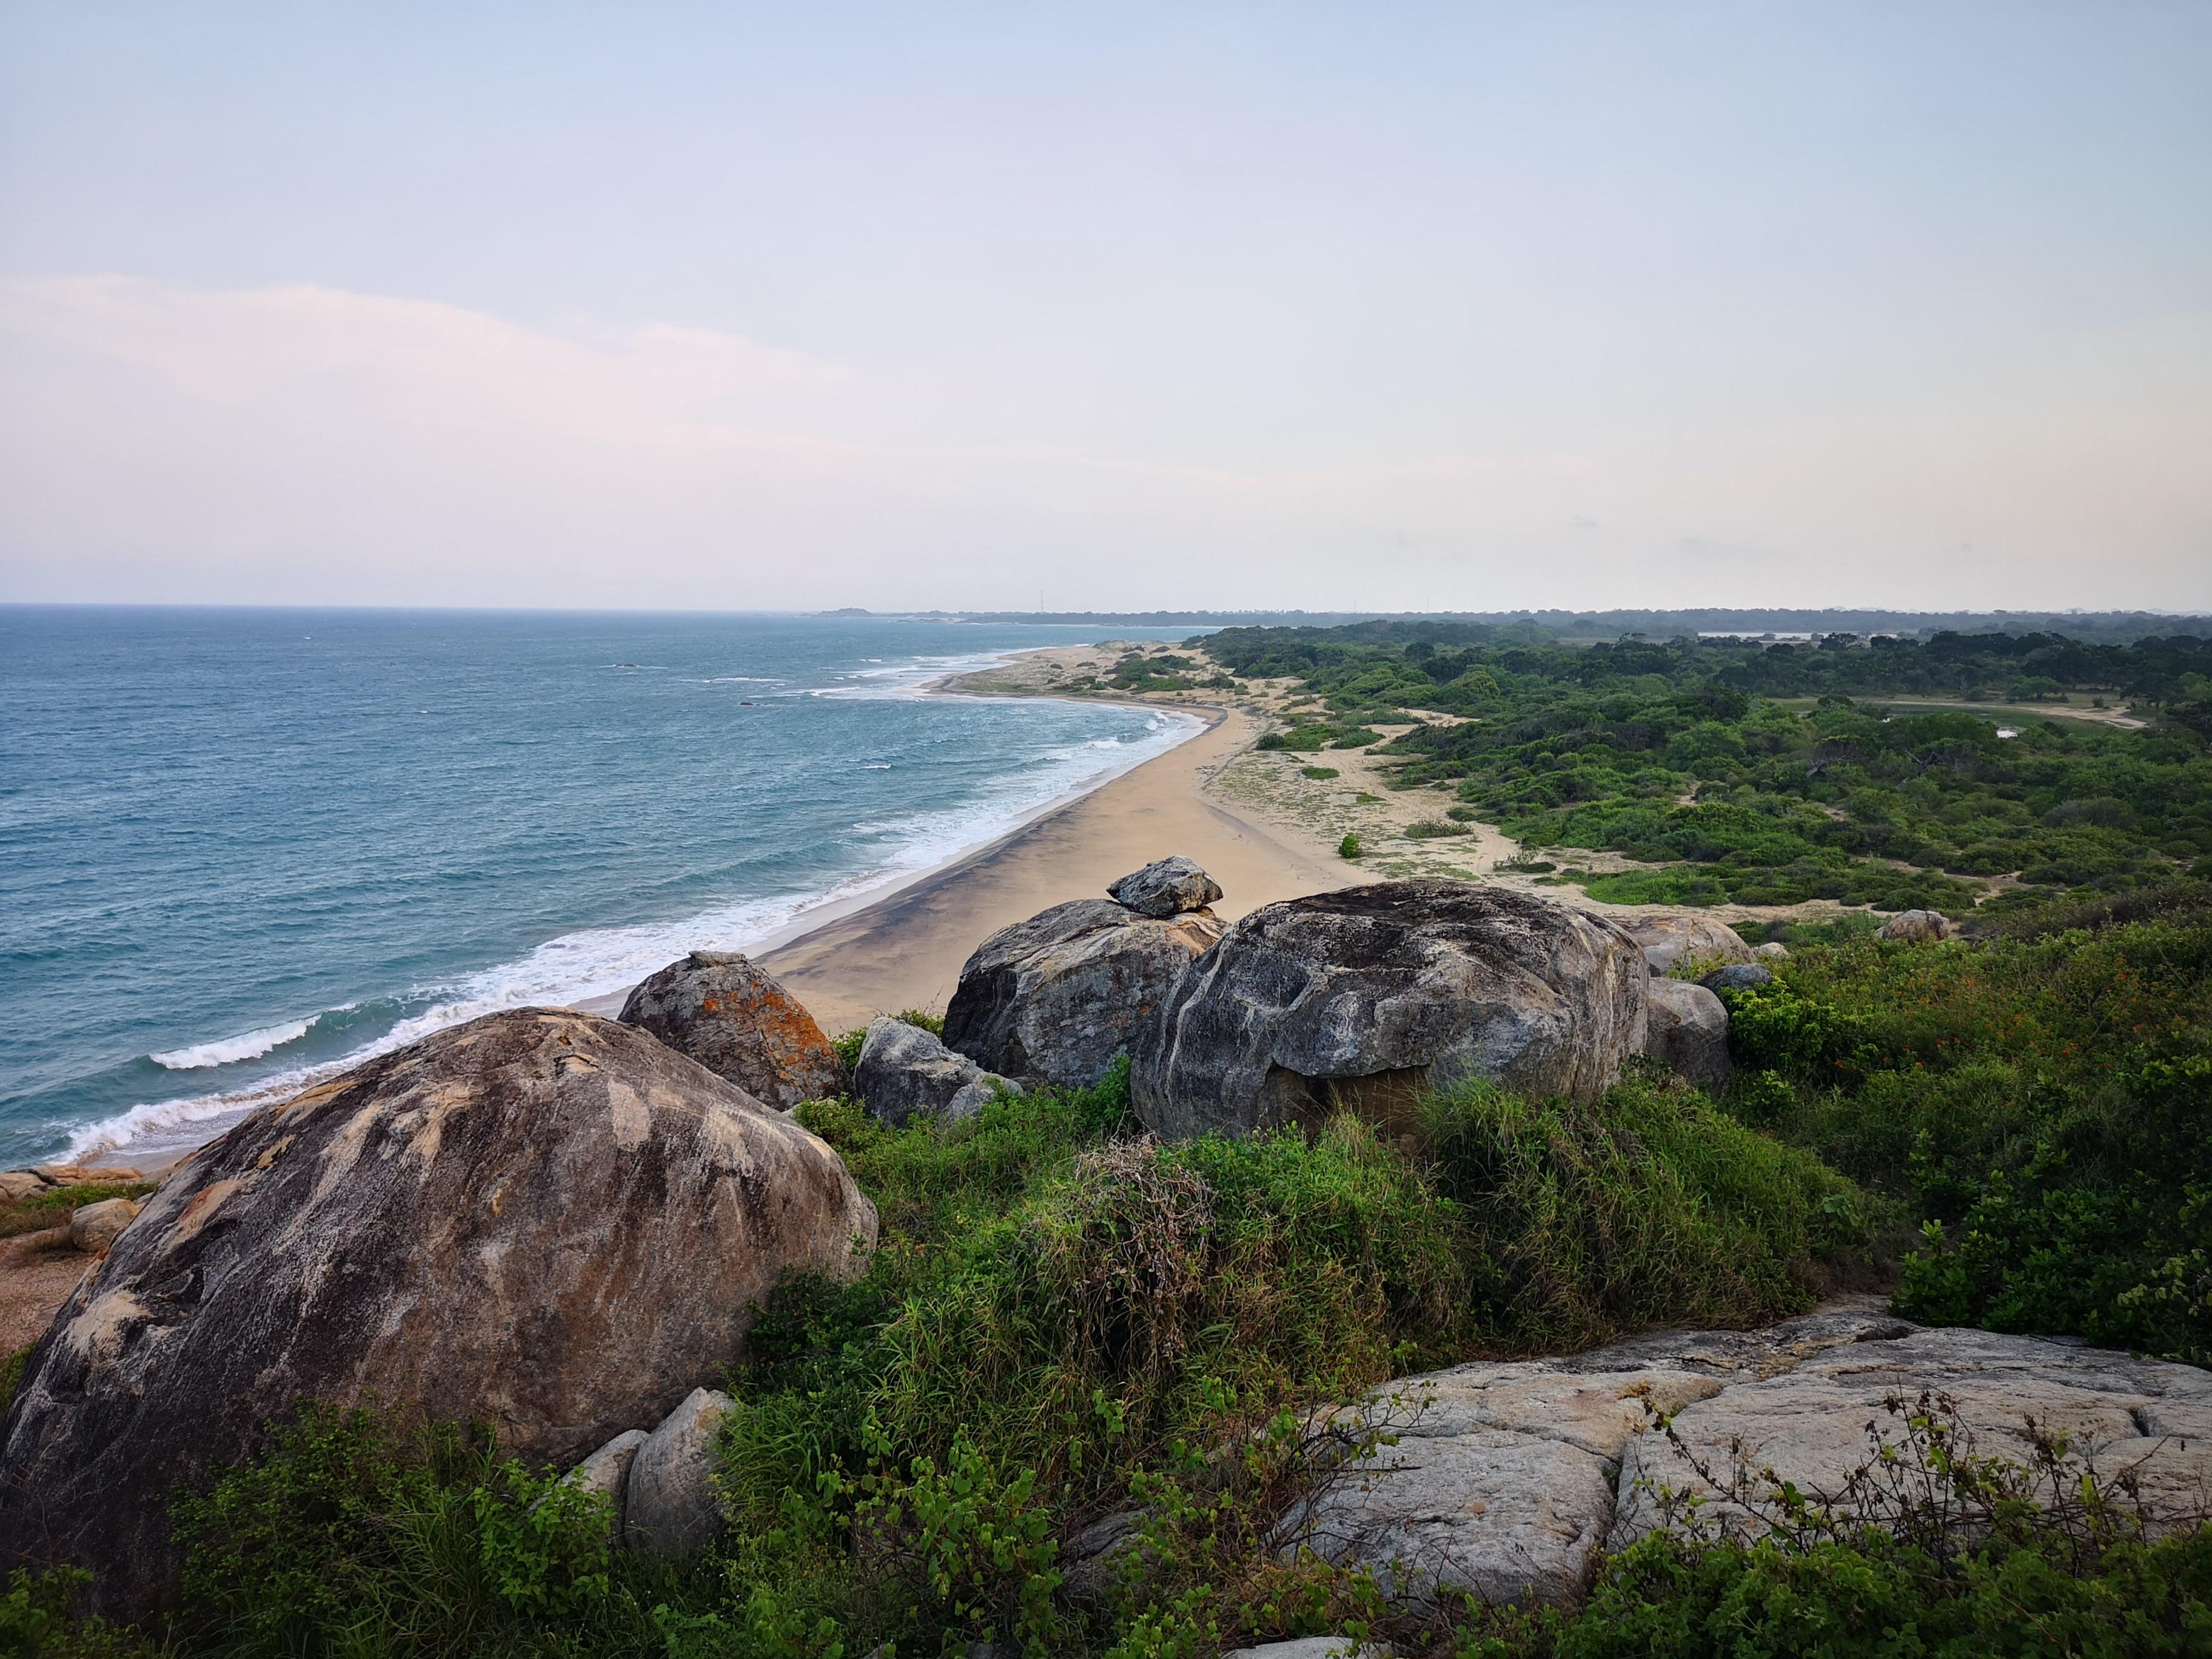 plage terre rochers vagues vert mer océan